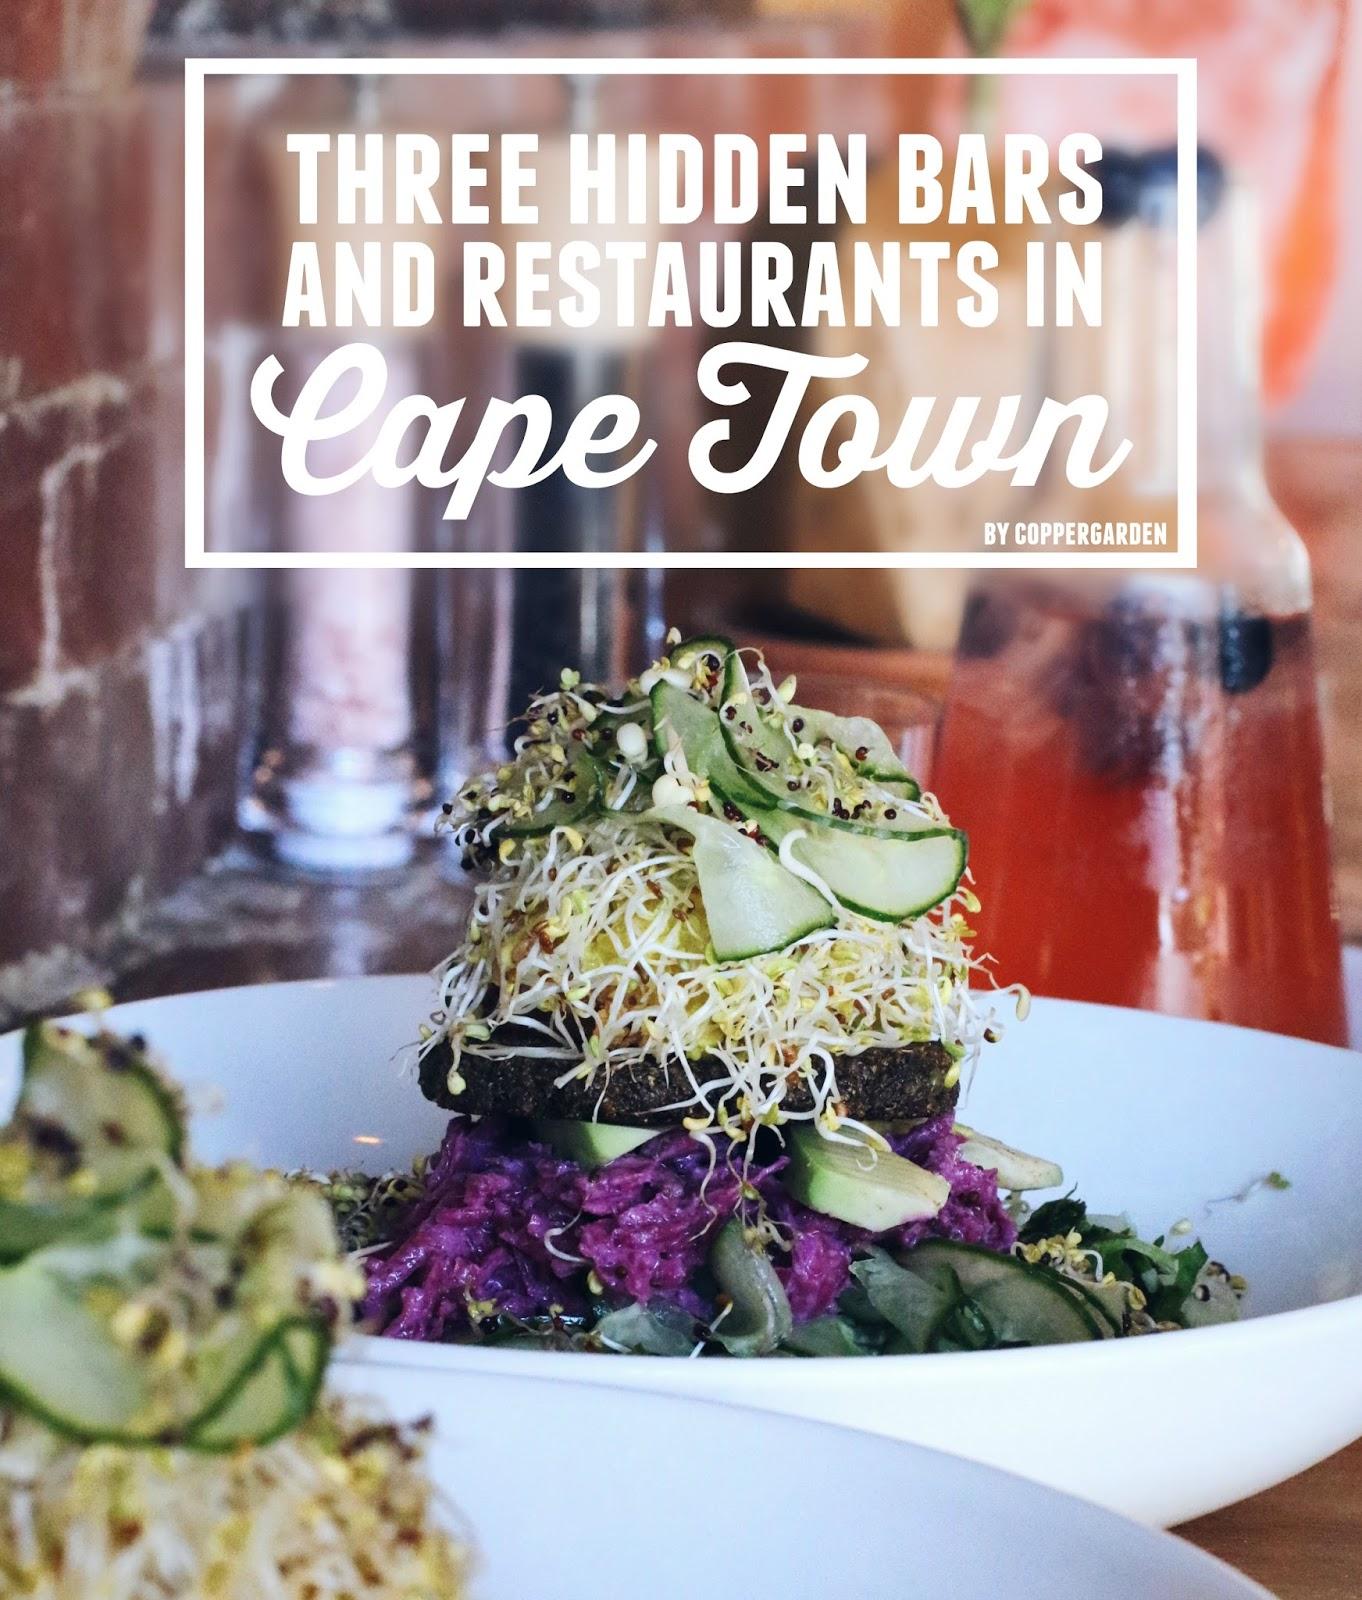 hidden bars and restaurants Cape Town, copper garden